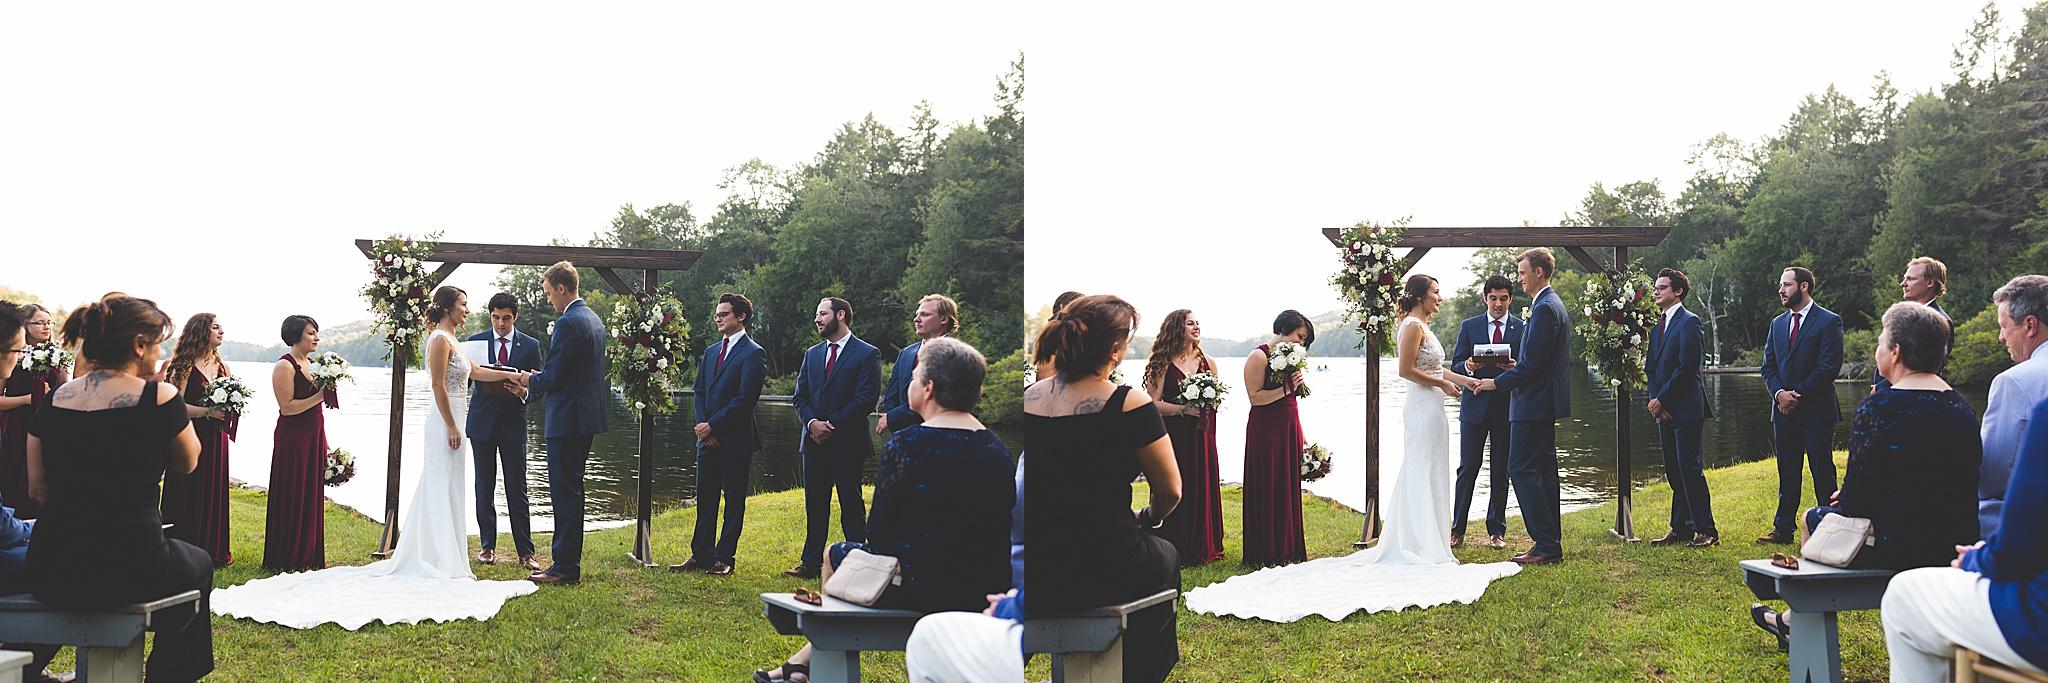 Albany_Wedding_Photographer_7523.jpg